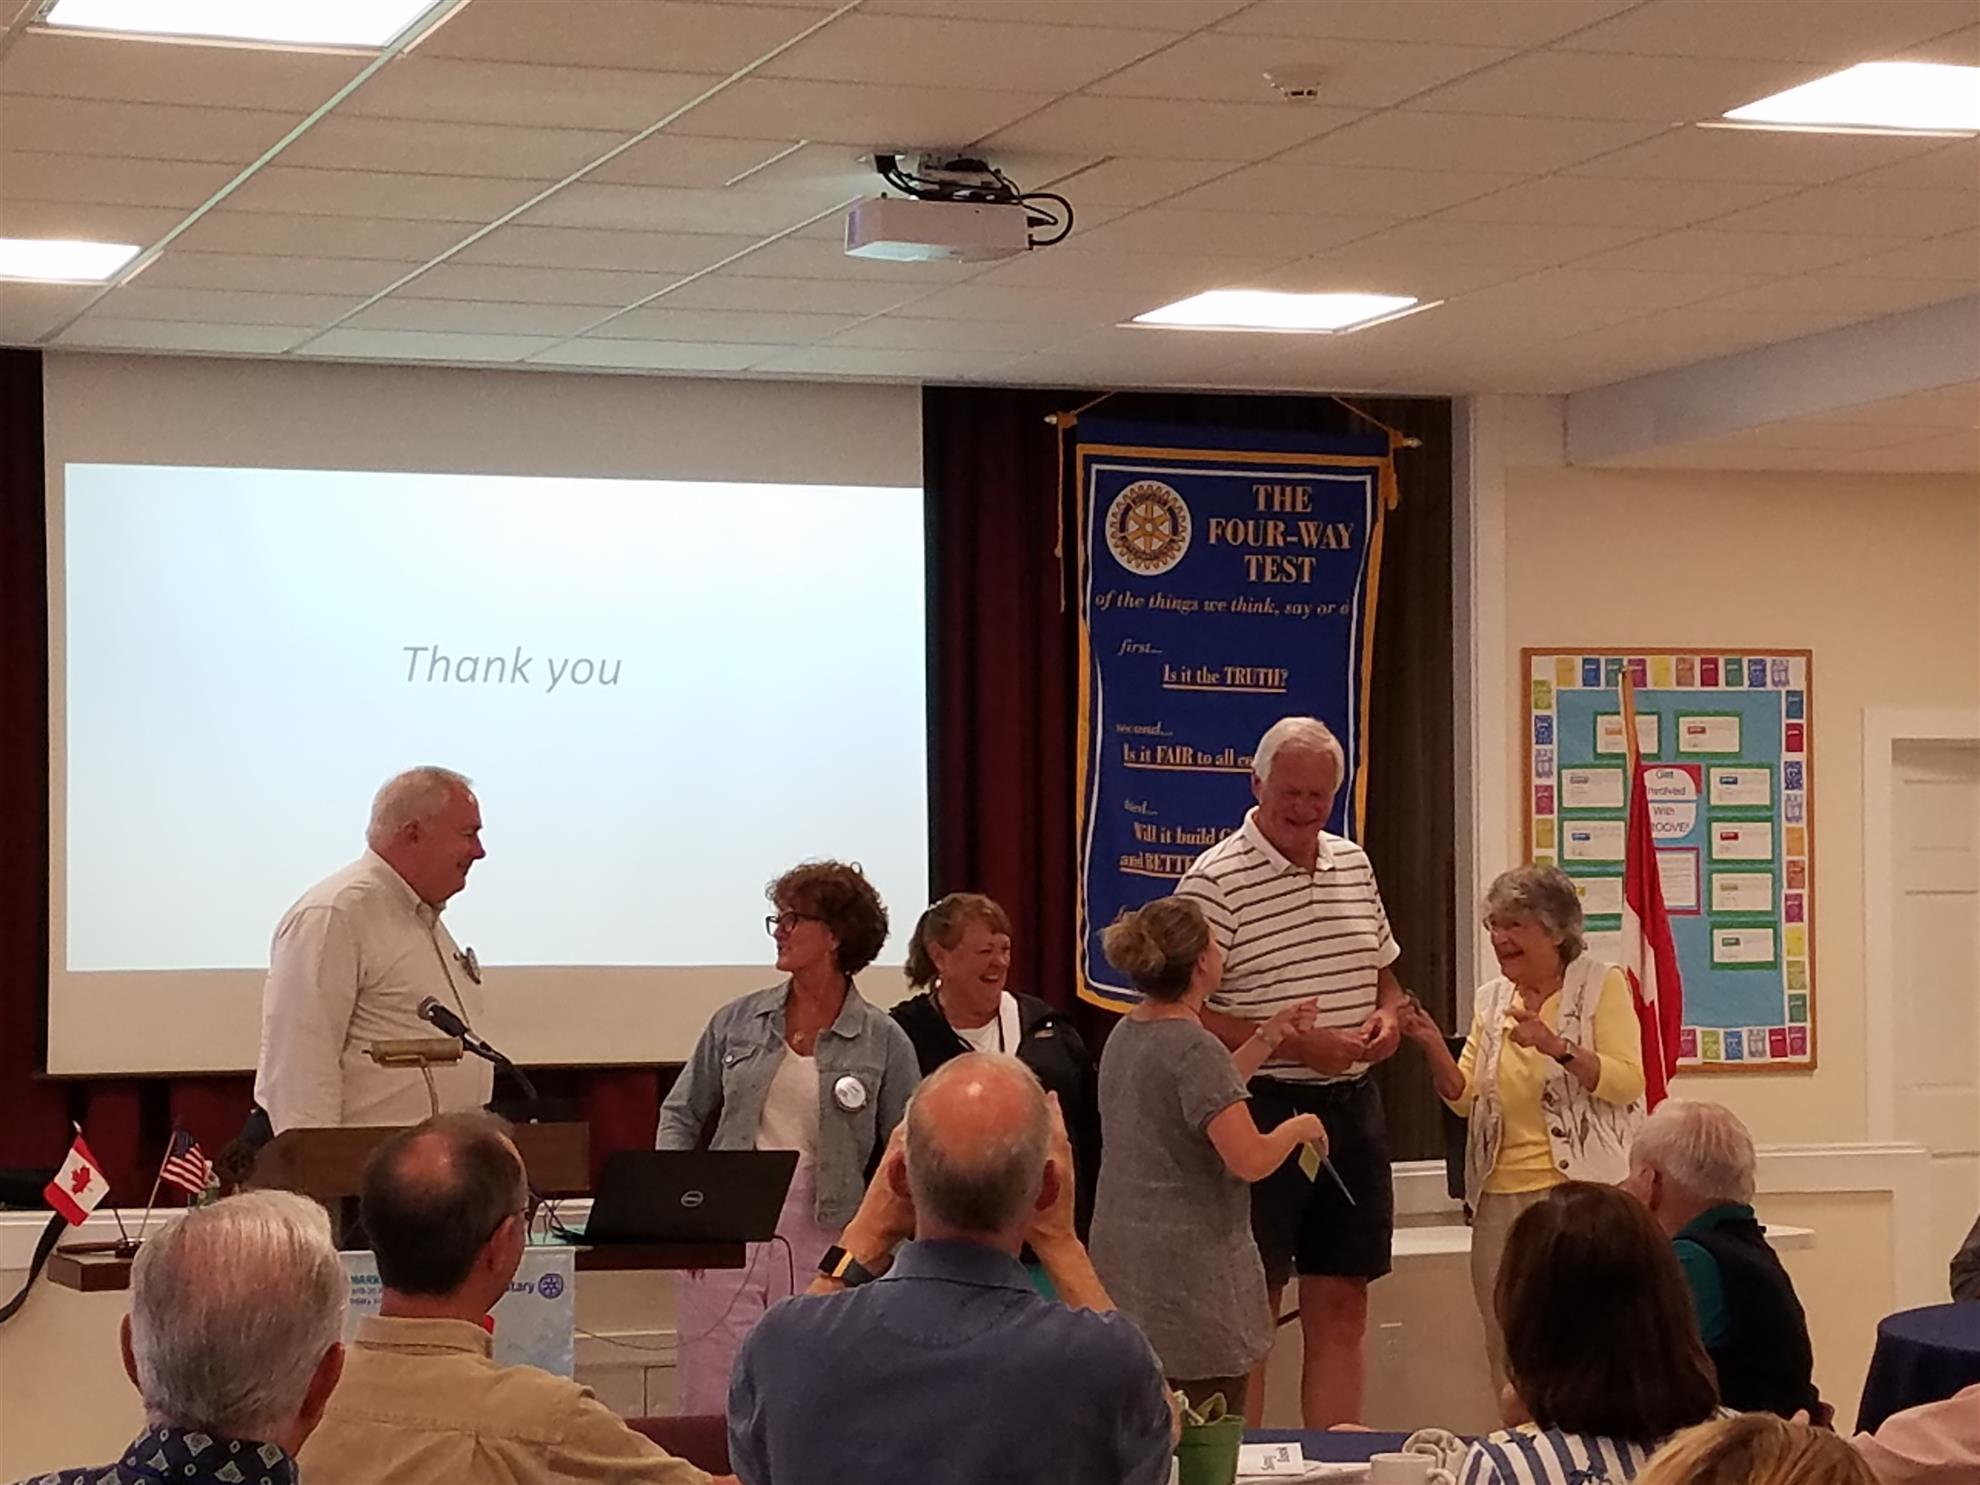 June 20, 2019 Meeting of West Bay Rotary (Jun 20, 2019)